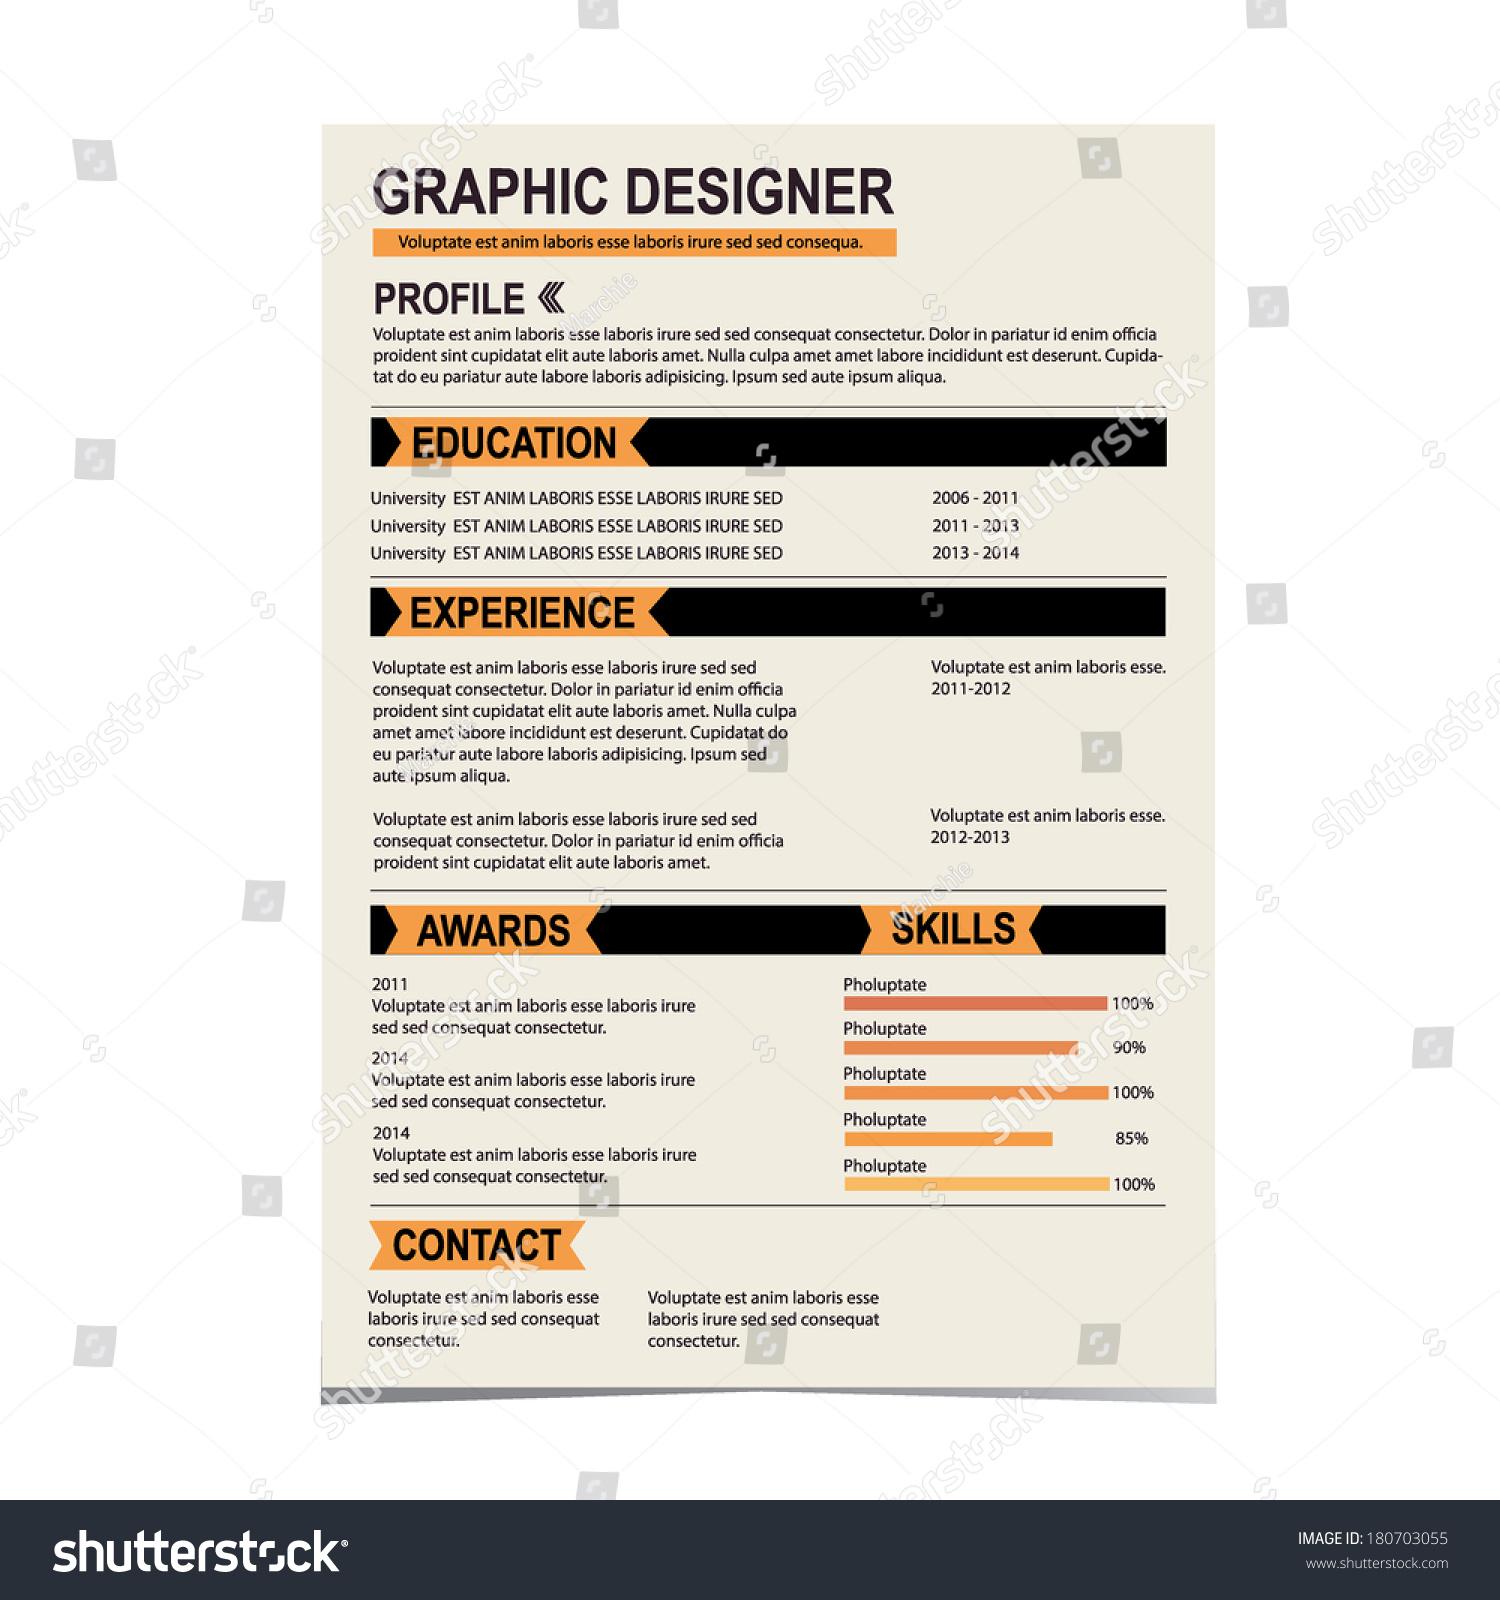 resume template cv creative background vector stock vector resume template cv creative background vector illustration